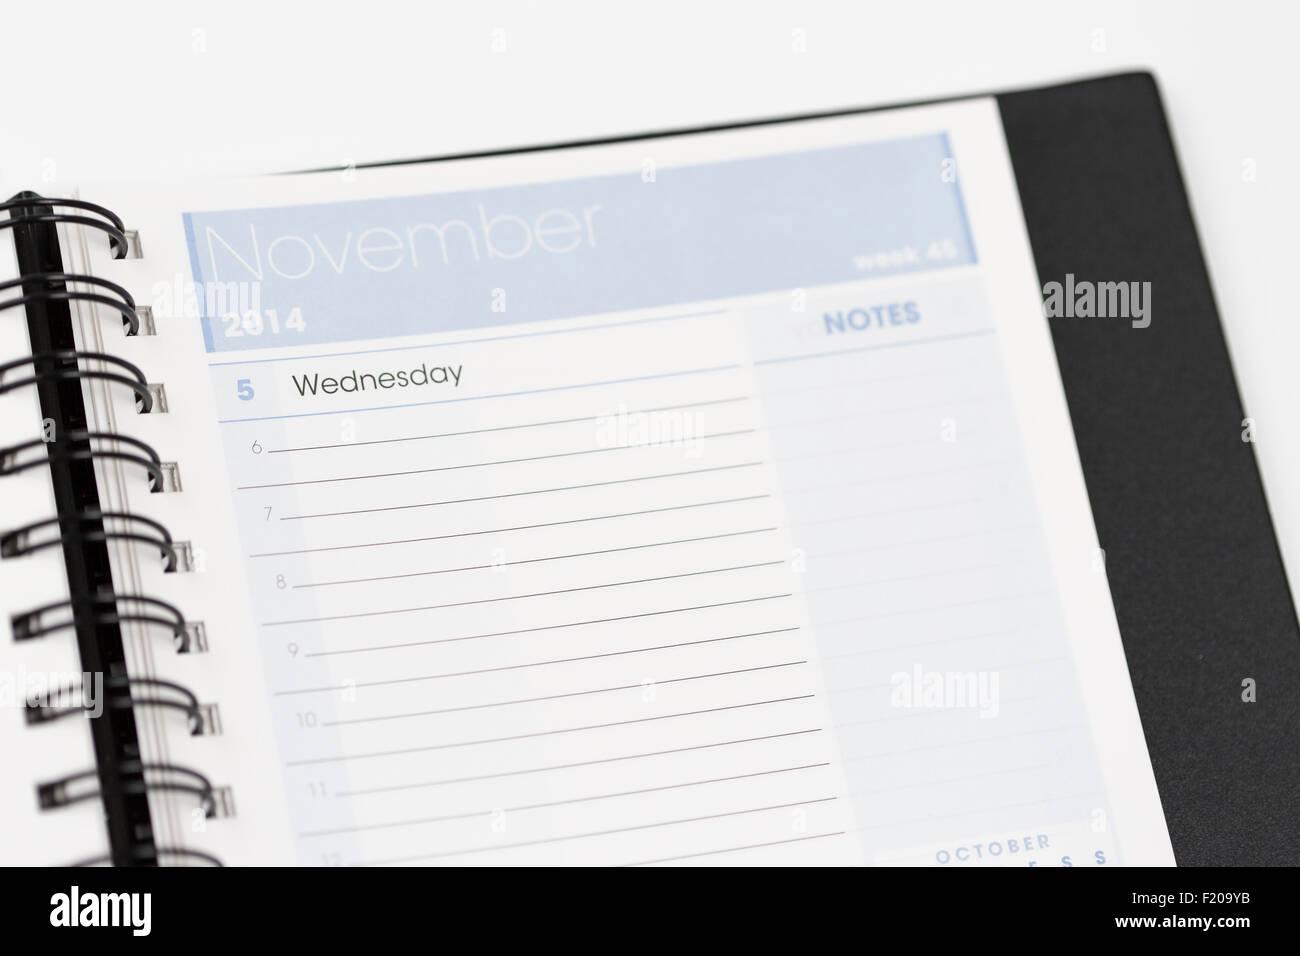 Calendar November 2014 Diary Organiser Organizer - Stock Image